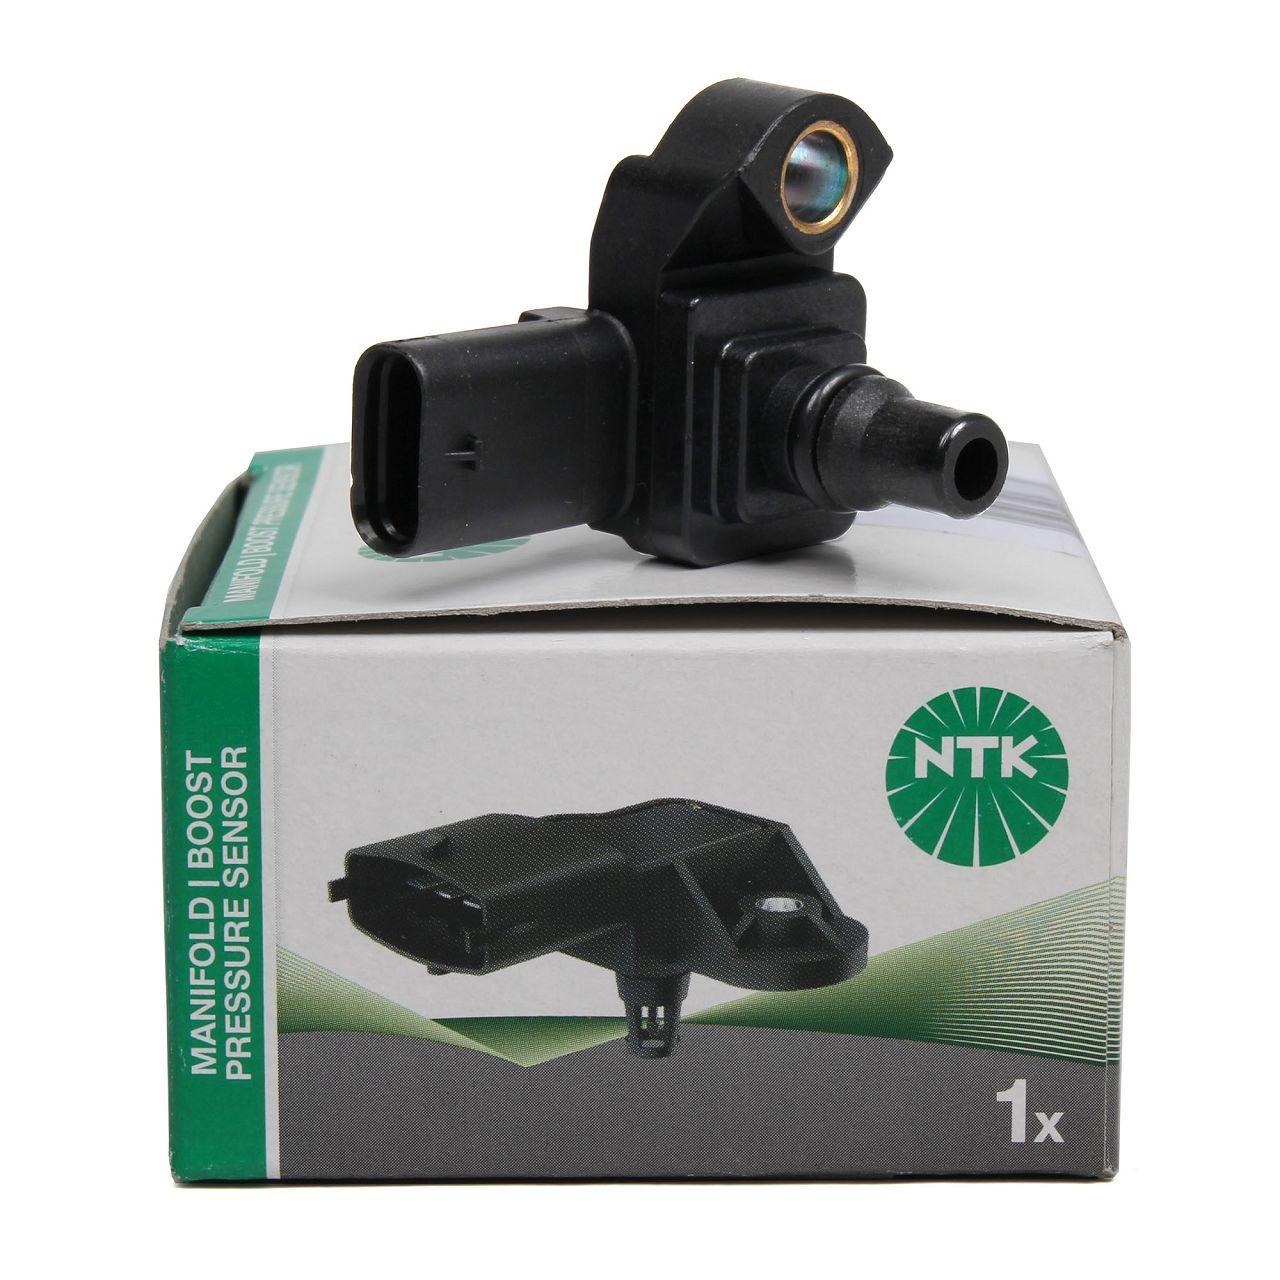 NGK NTK 94886 Unterdrucksensor Sensor Saugrohrdruck für BMW MINI TOYOTA